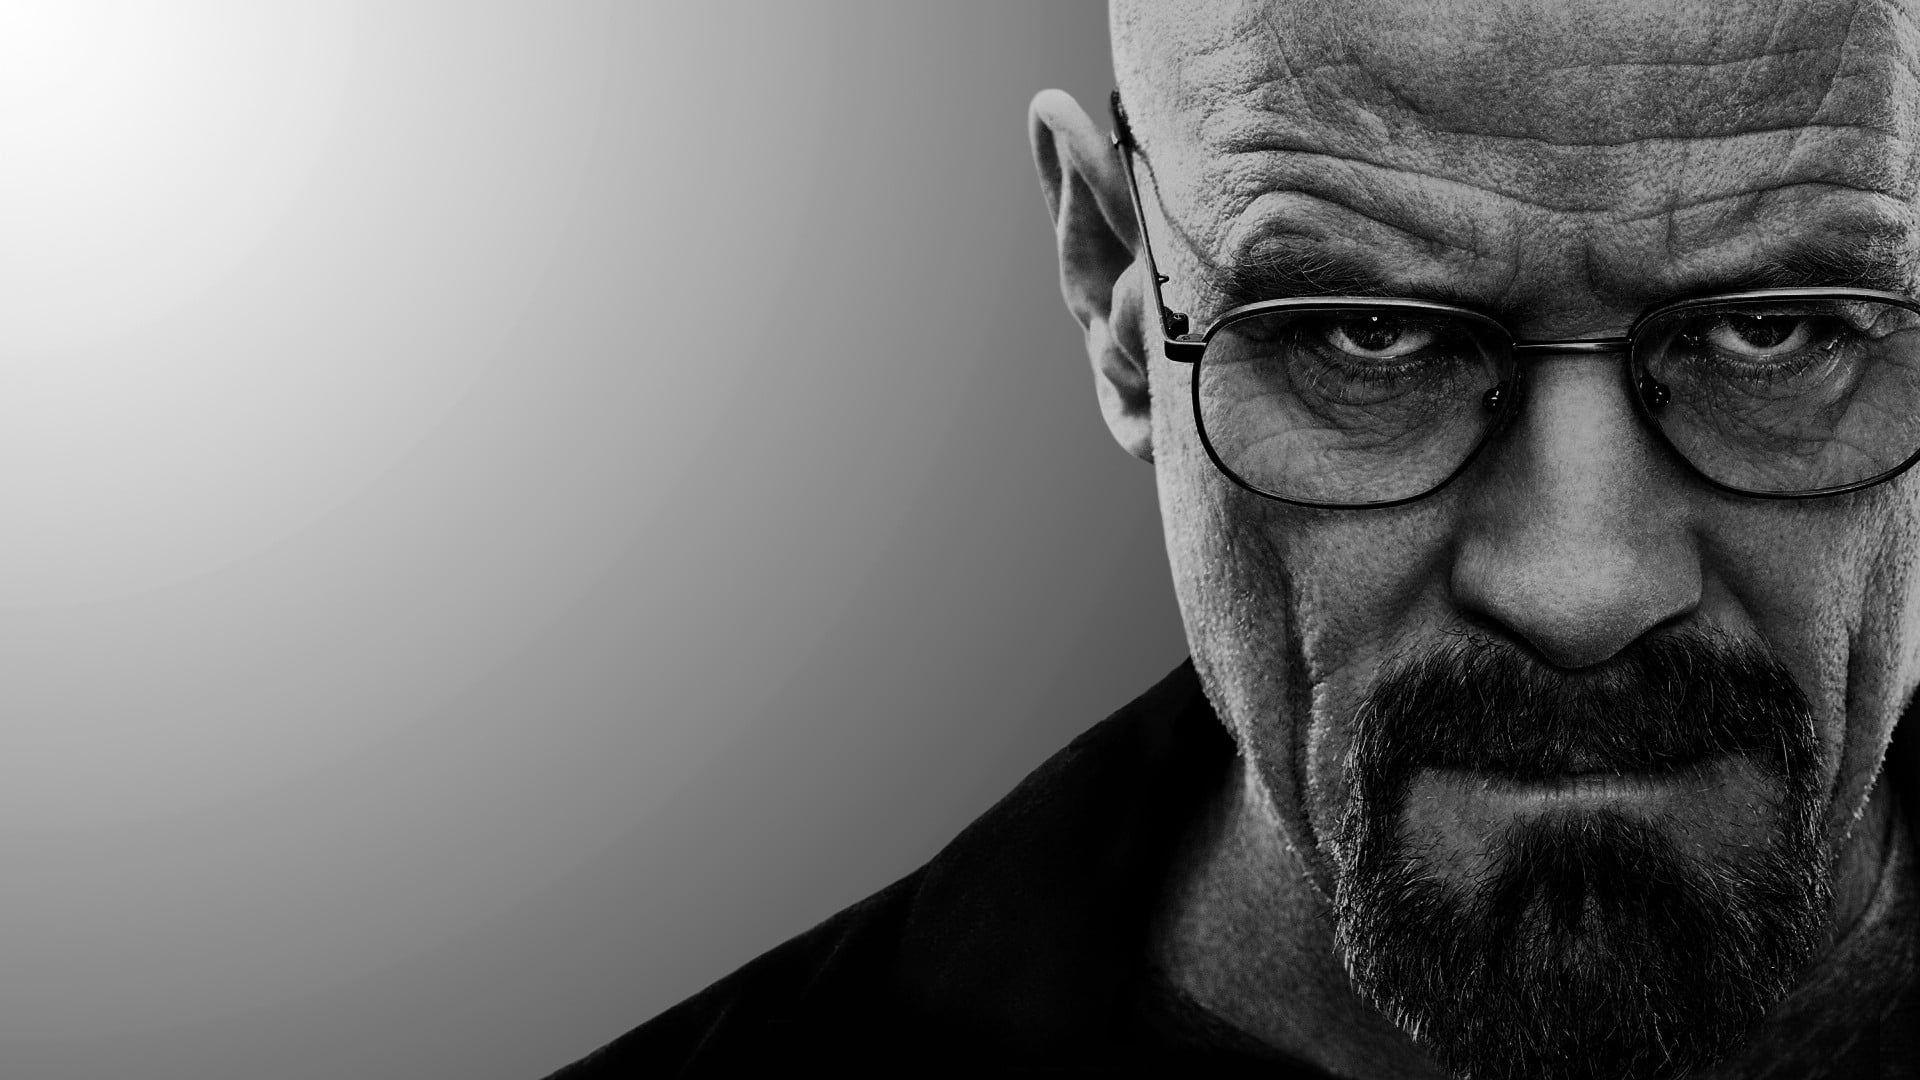 Men S Eyeglasses And Crew Neck Shirt Breaking Bad 1080p Wallpaper Hdwallpaper Desktop Breaking Bad Tattoo Breaking Bad Bad Picture